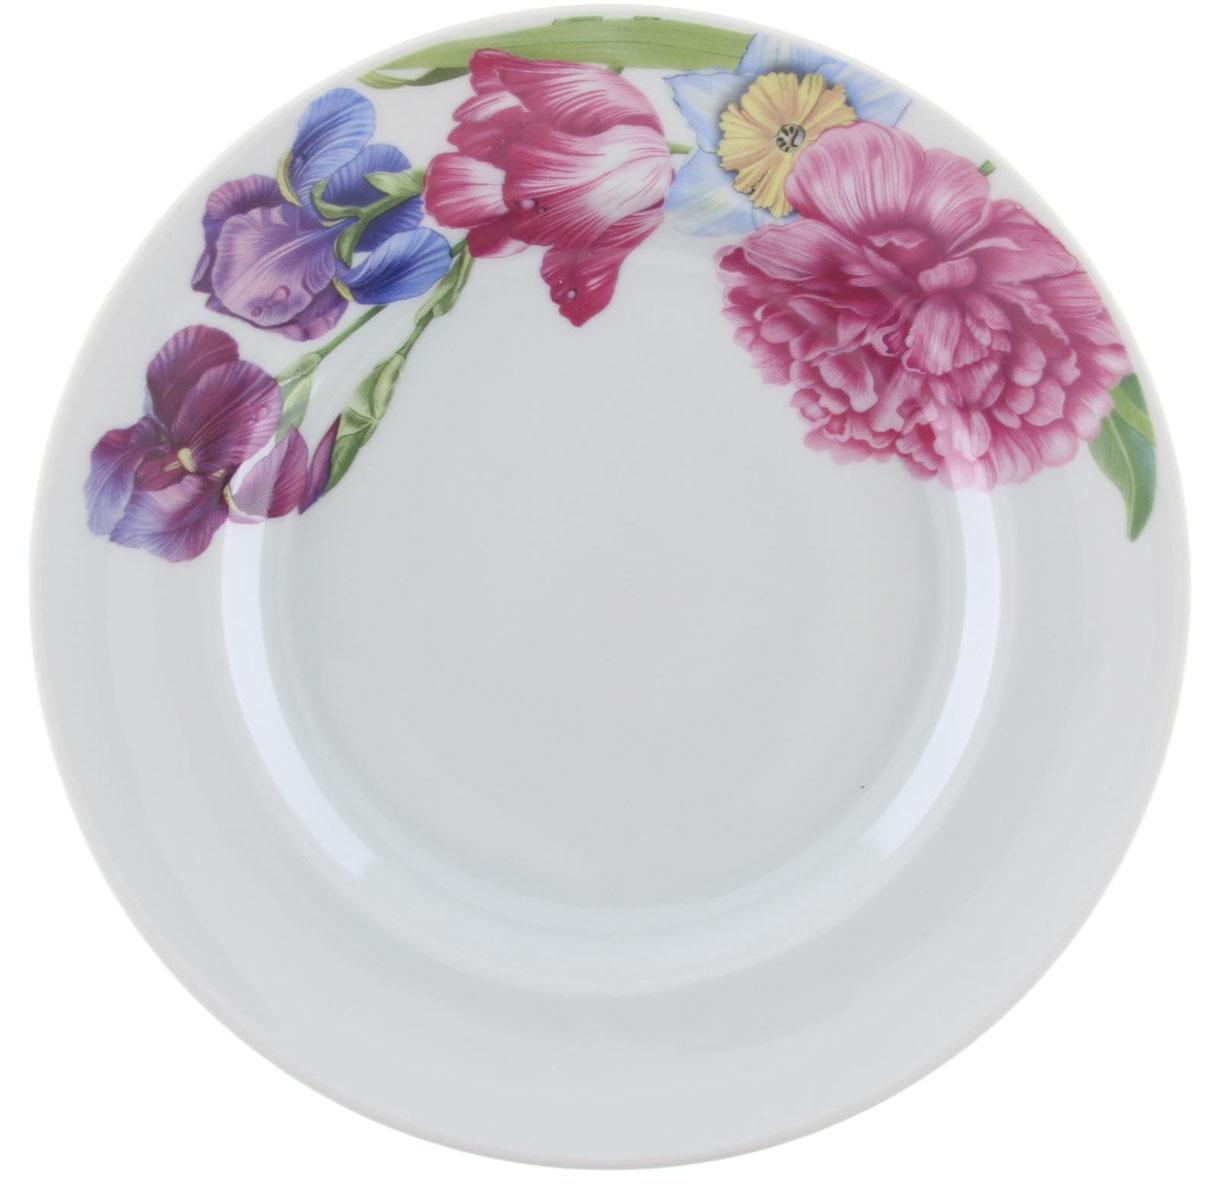 Тарелка мелкая Идиллия. Английская классика, диаметр 20 см1303788